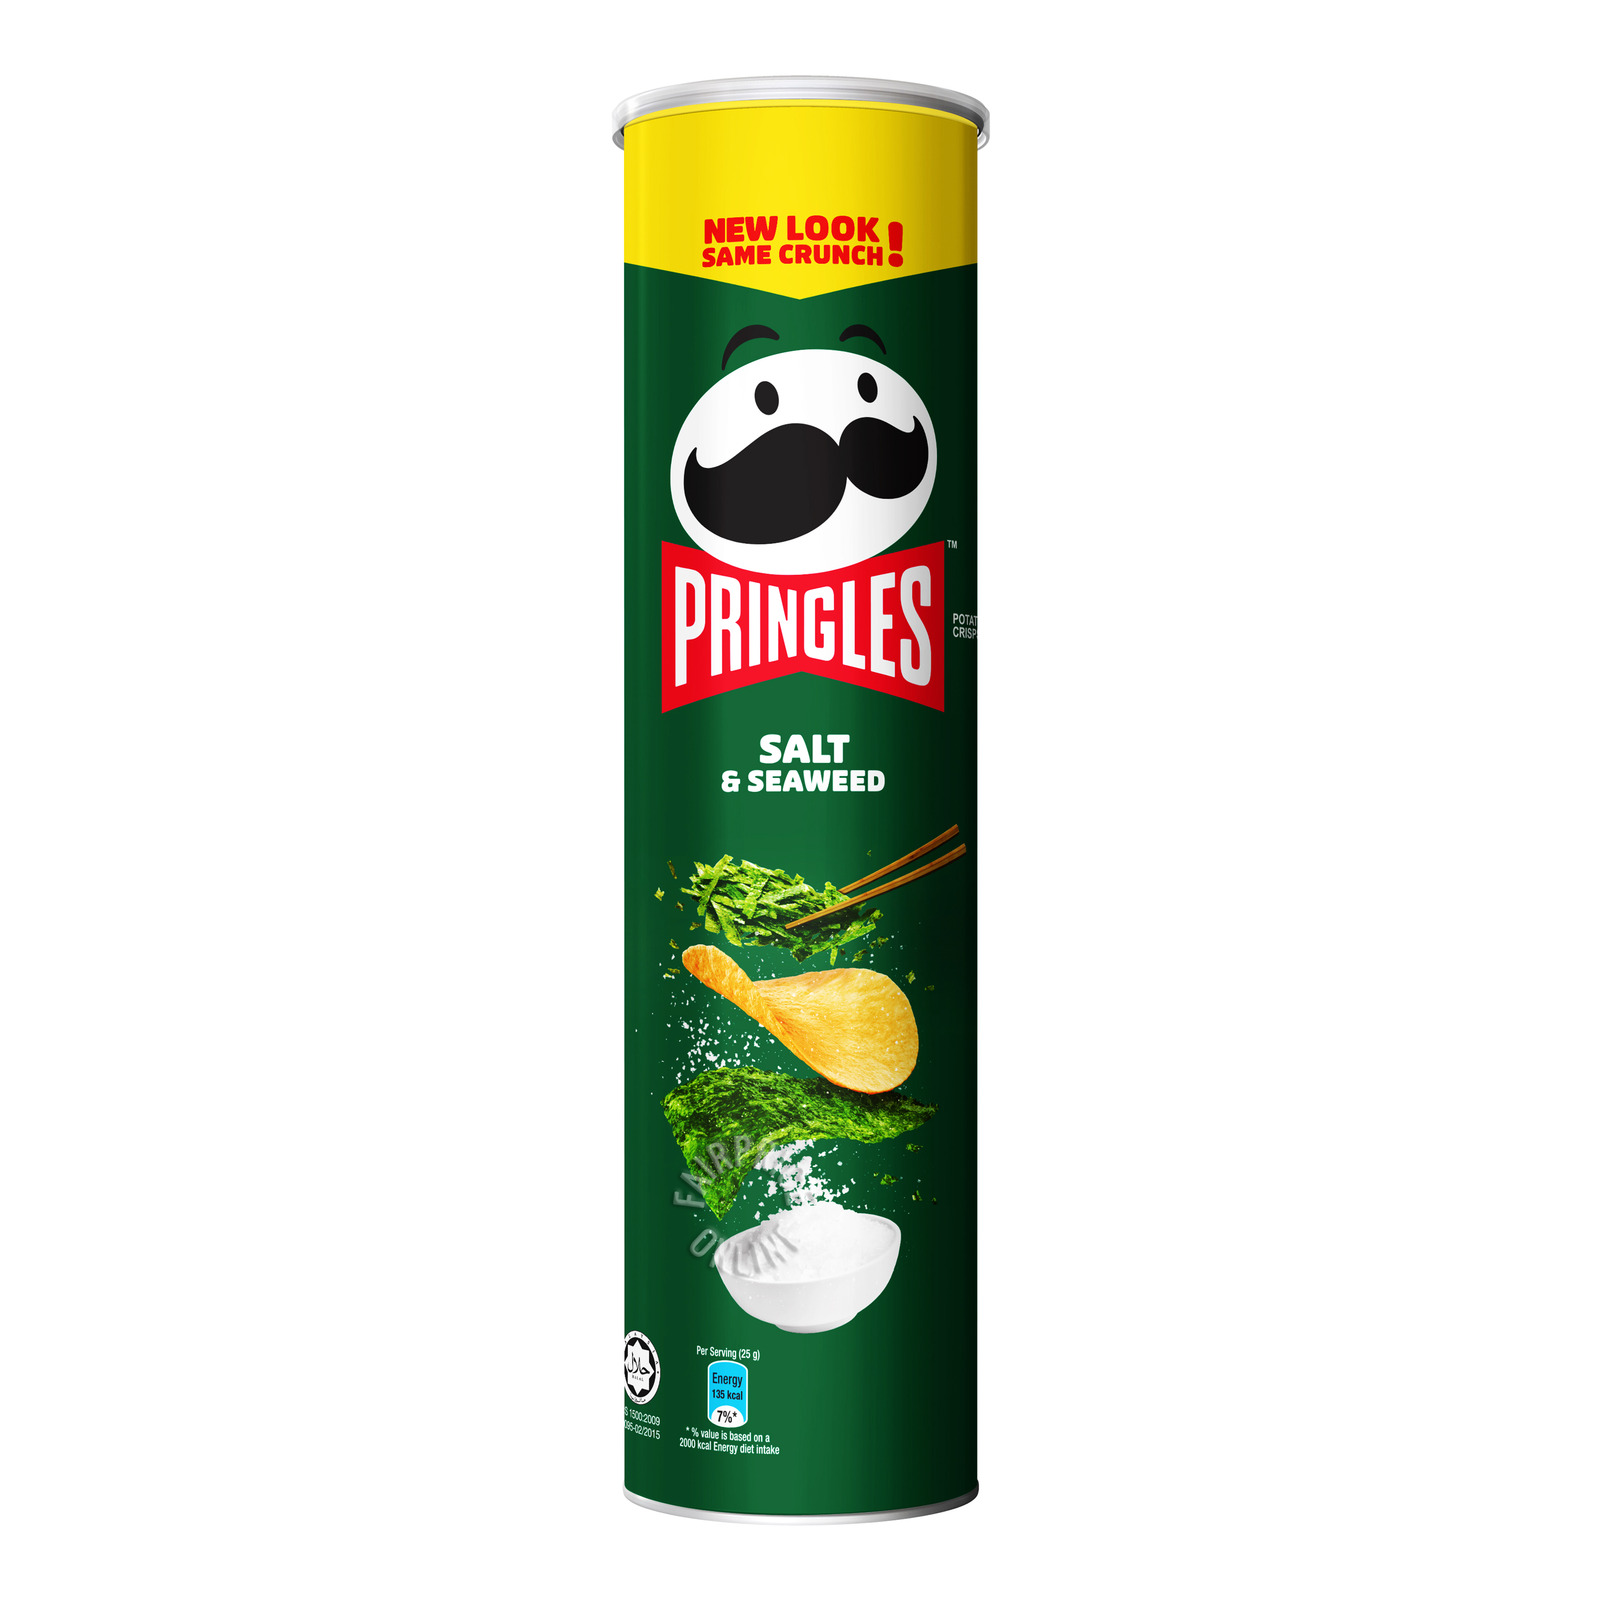 Pringles Potato Crisps - Salt & Seaweed